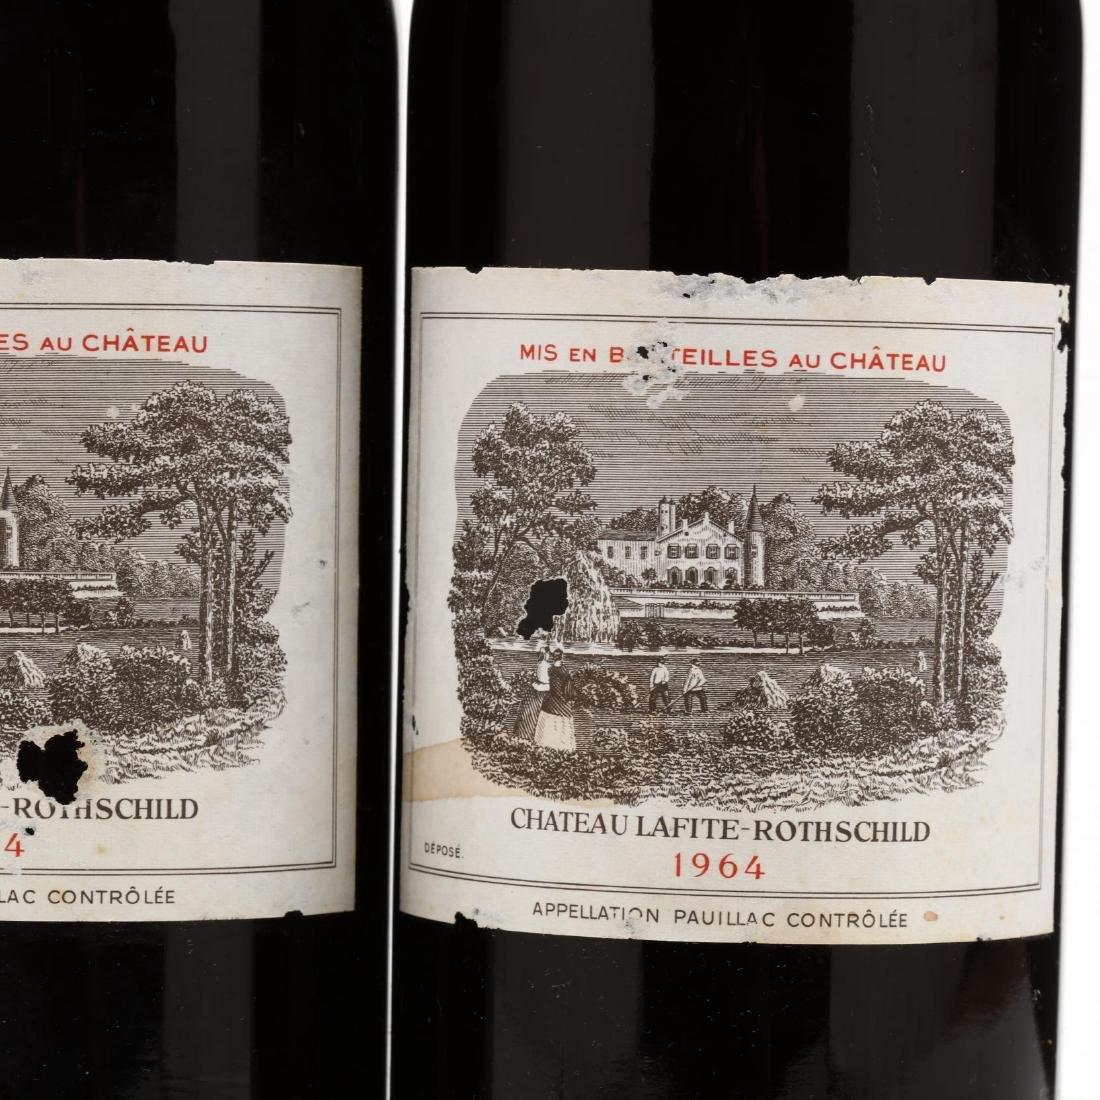 Chateau Lafite-Rothschild - Vintage 1964 - 2